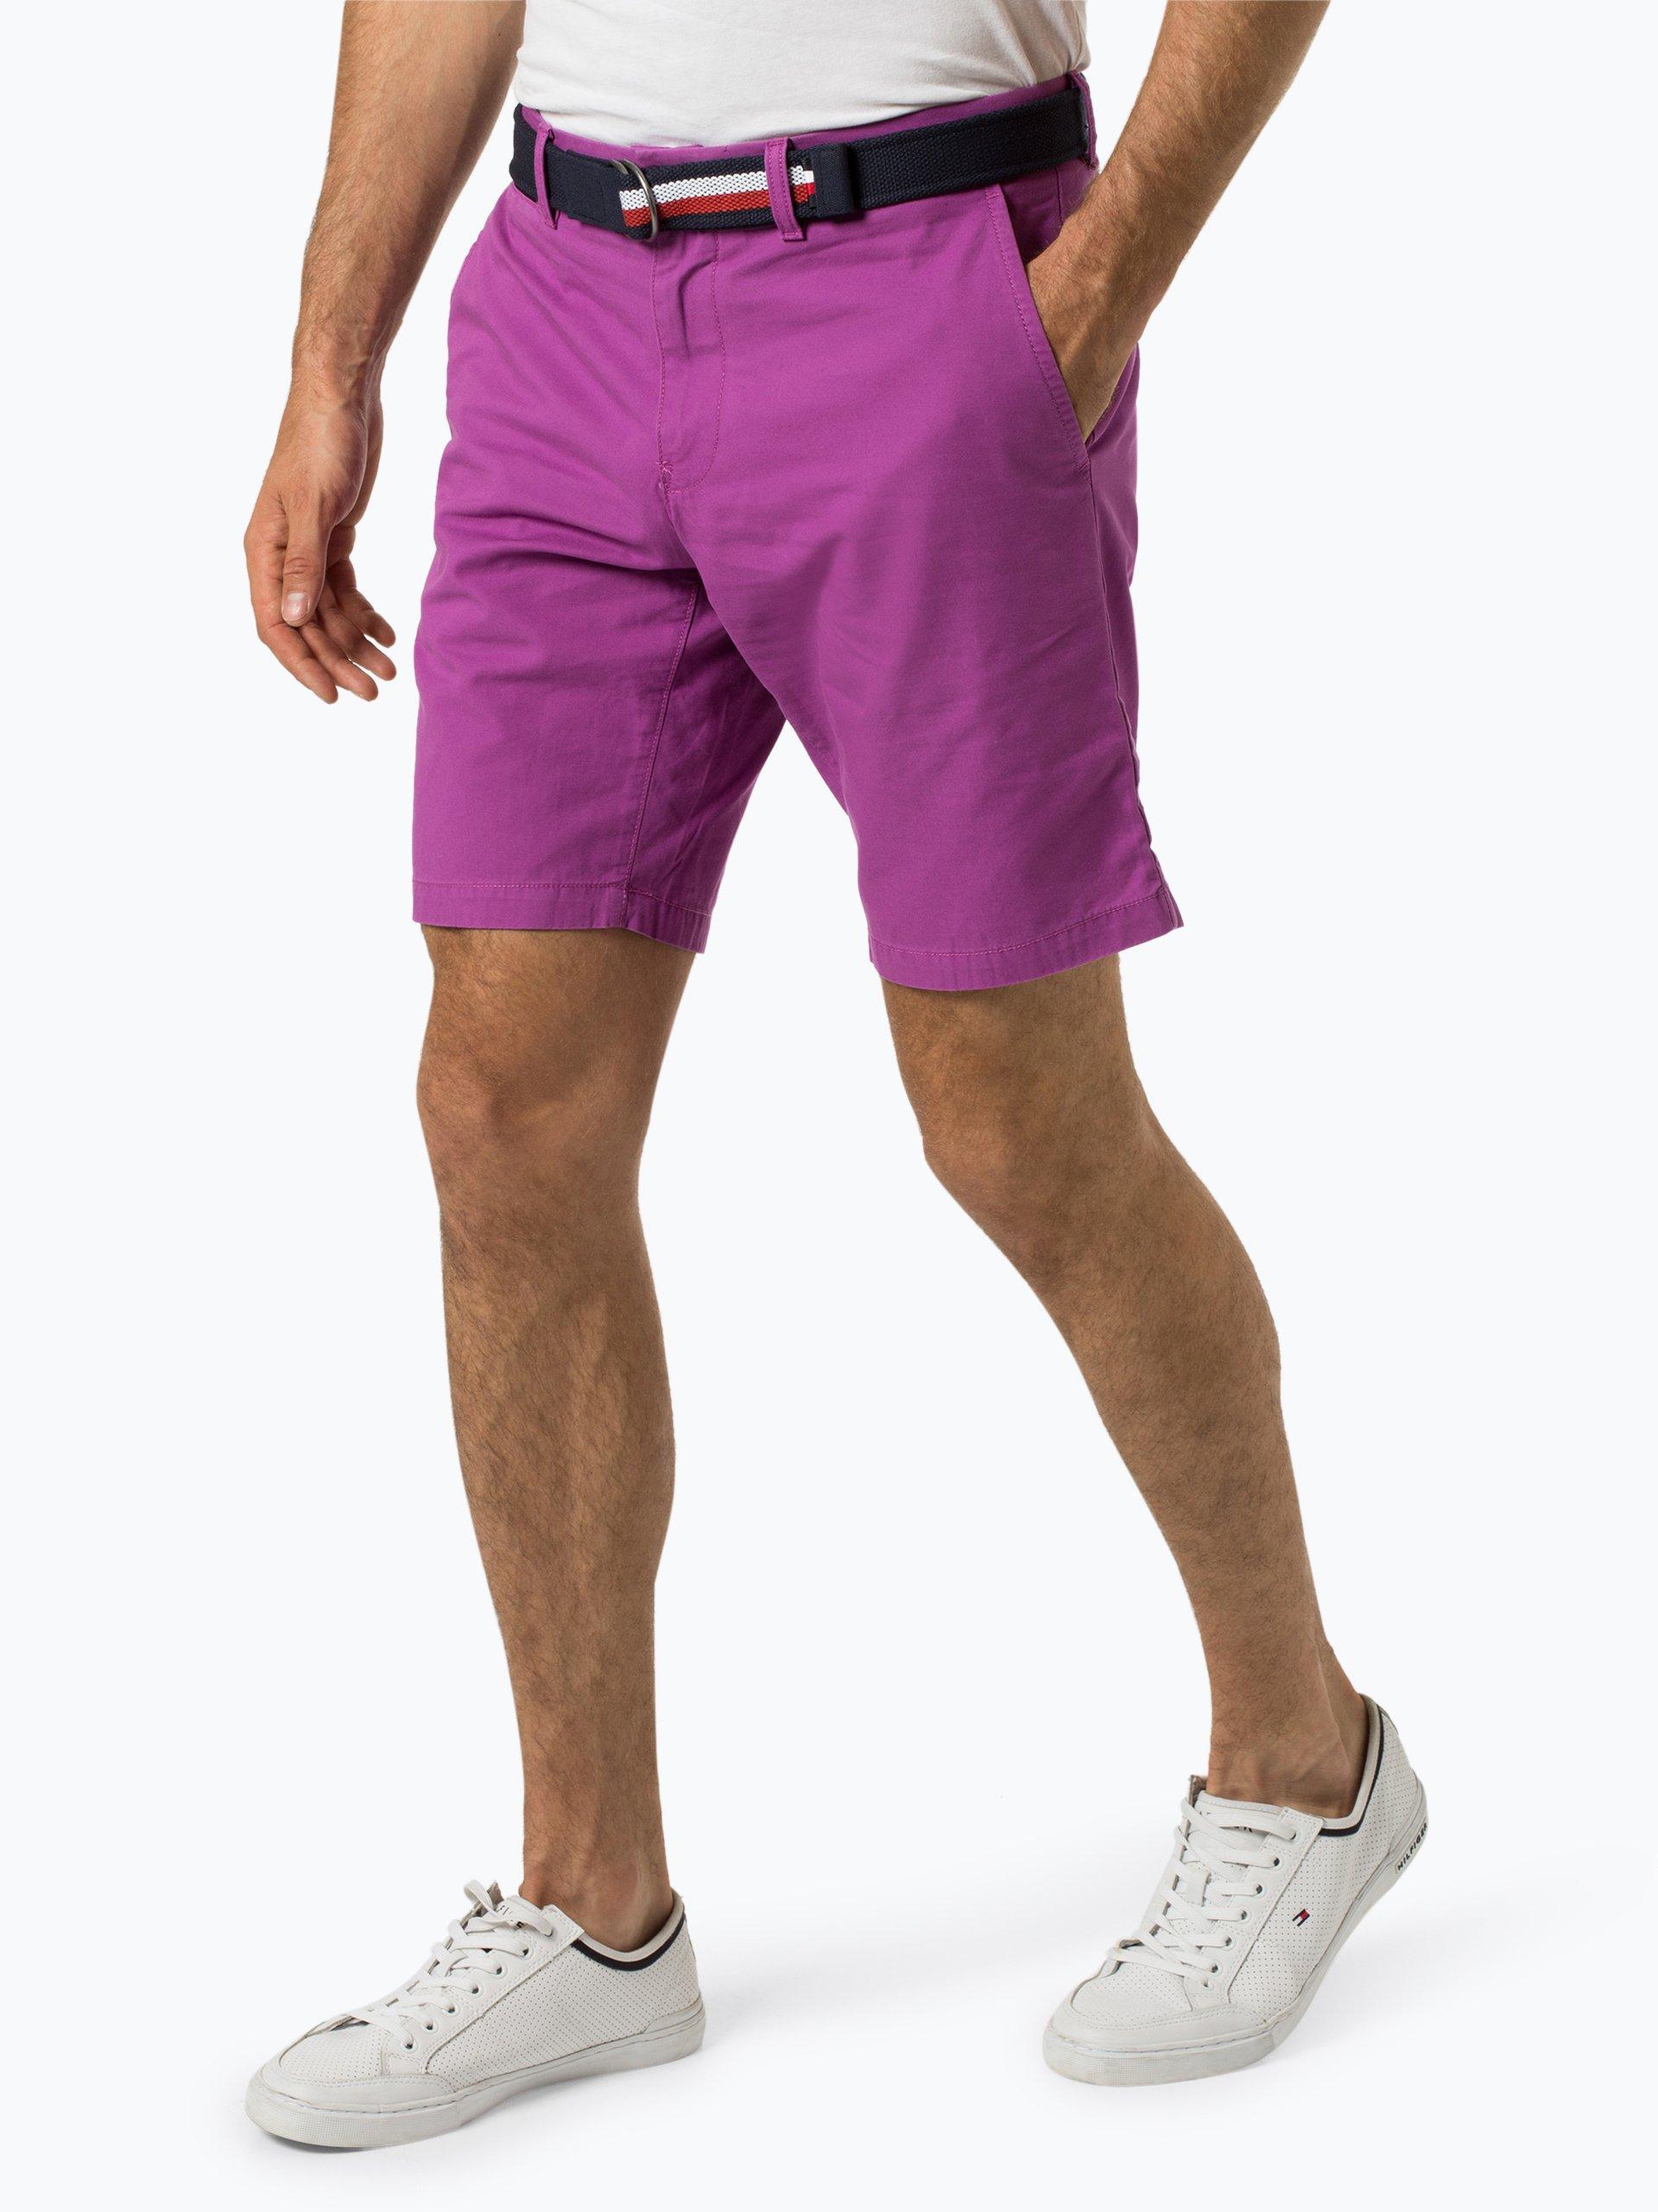 Tommy Hilfiger Herren Shorts - Brooklyn